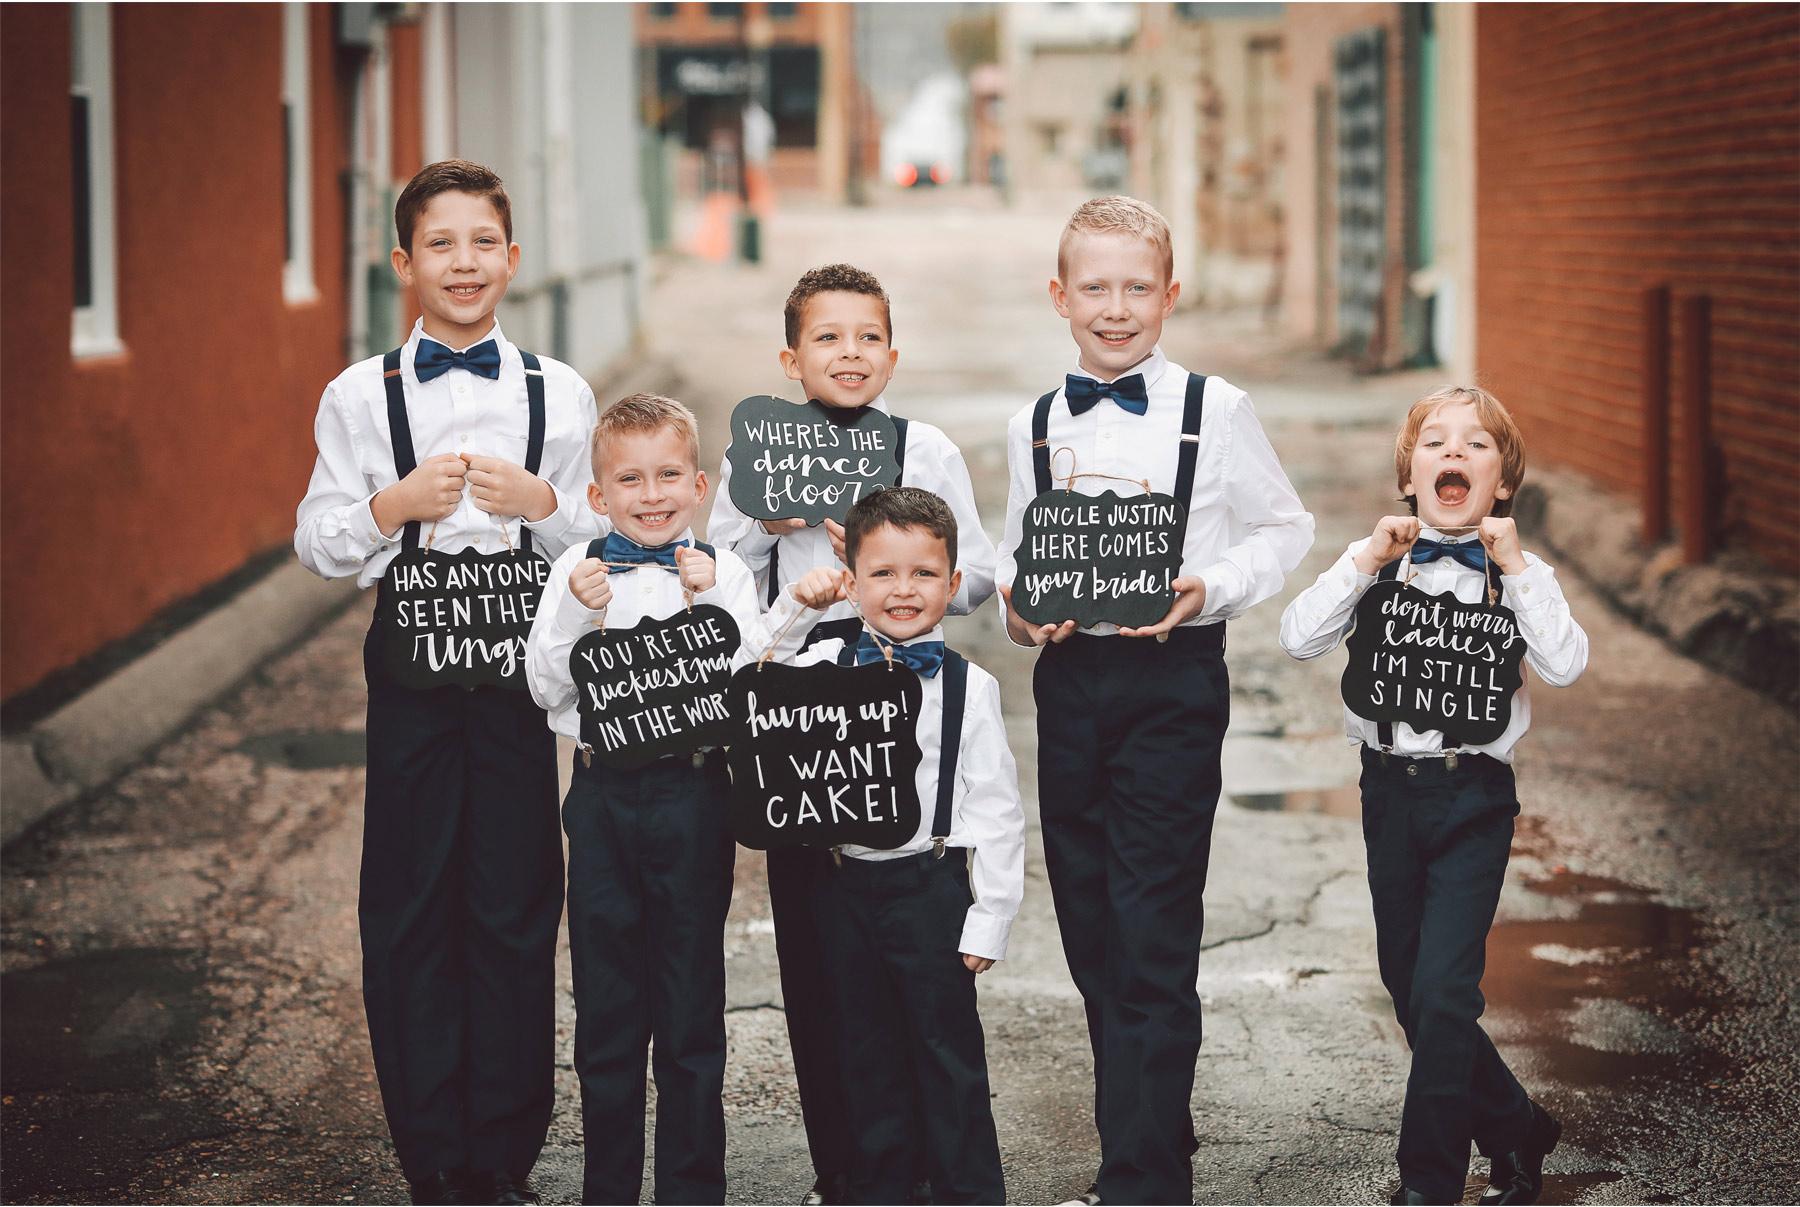 14-Shakopee-Minnesota-Wedding-Photography-by-Vick-Photography-Wedding-Signs-Ring-Bearers-Amber-and-Justin.jpg